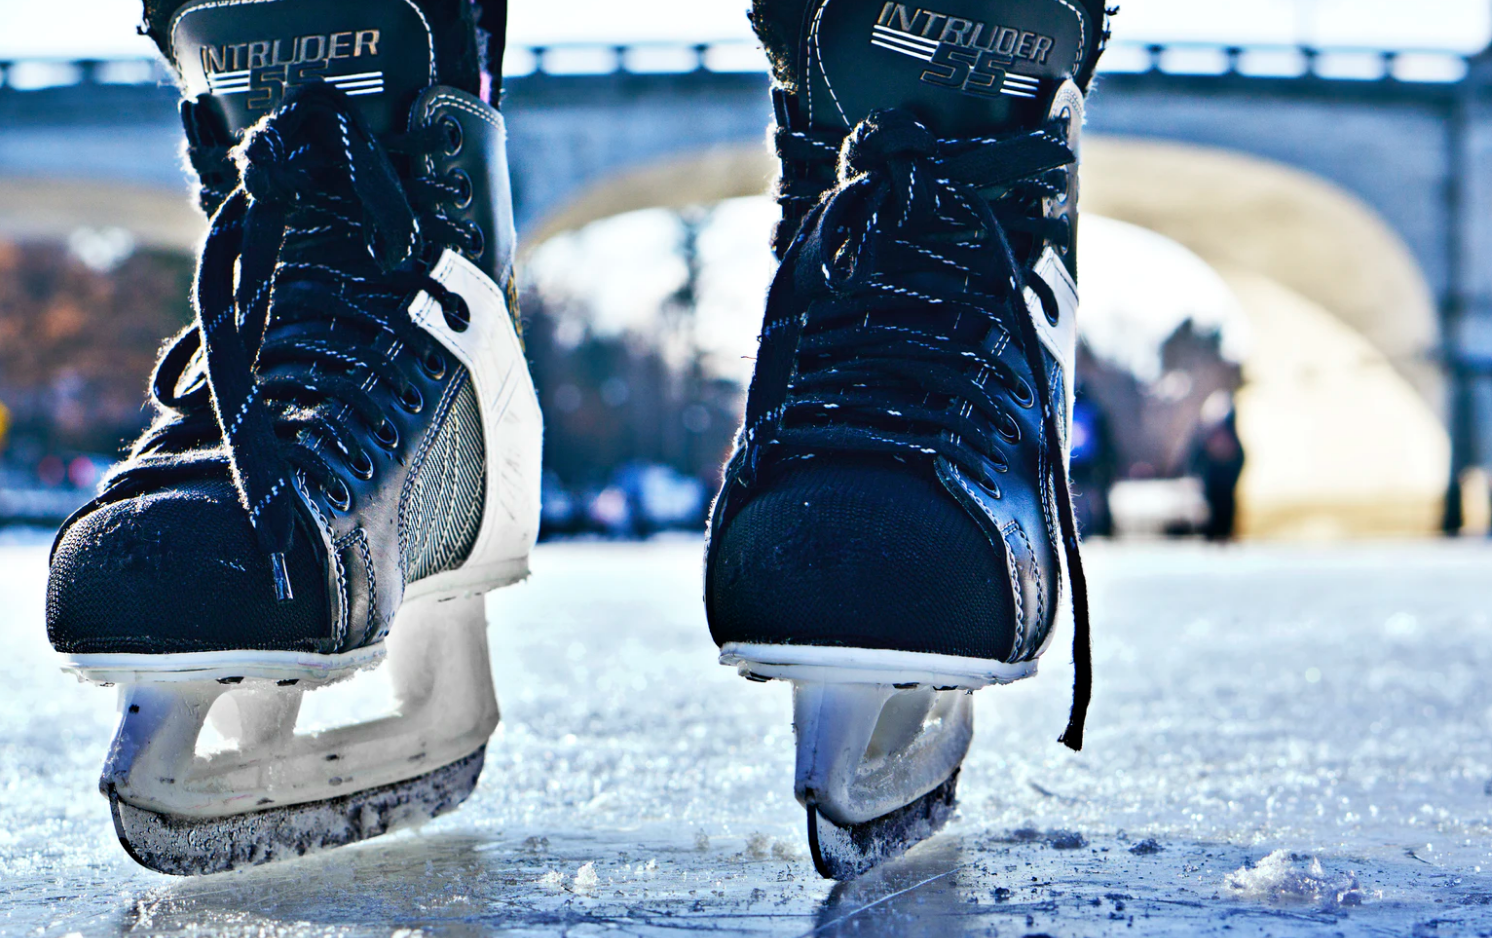 skates at the university of saskatchewan